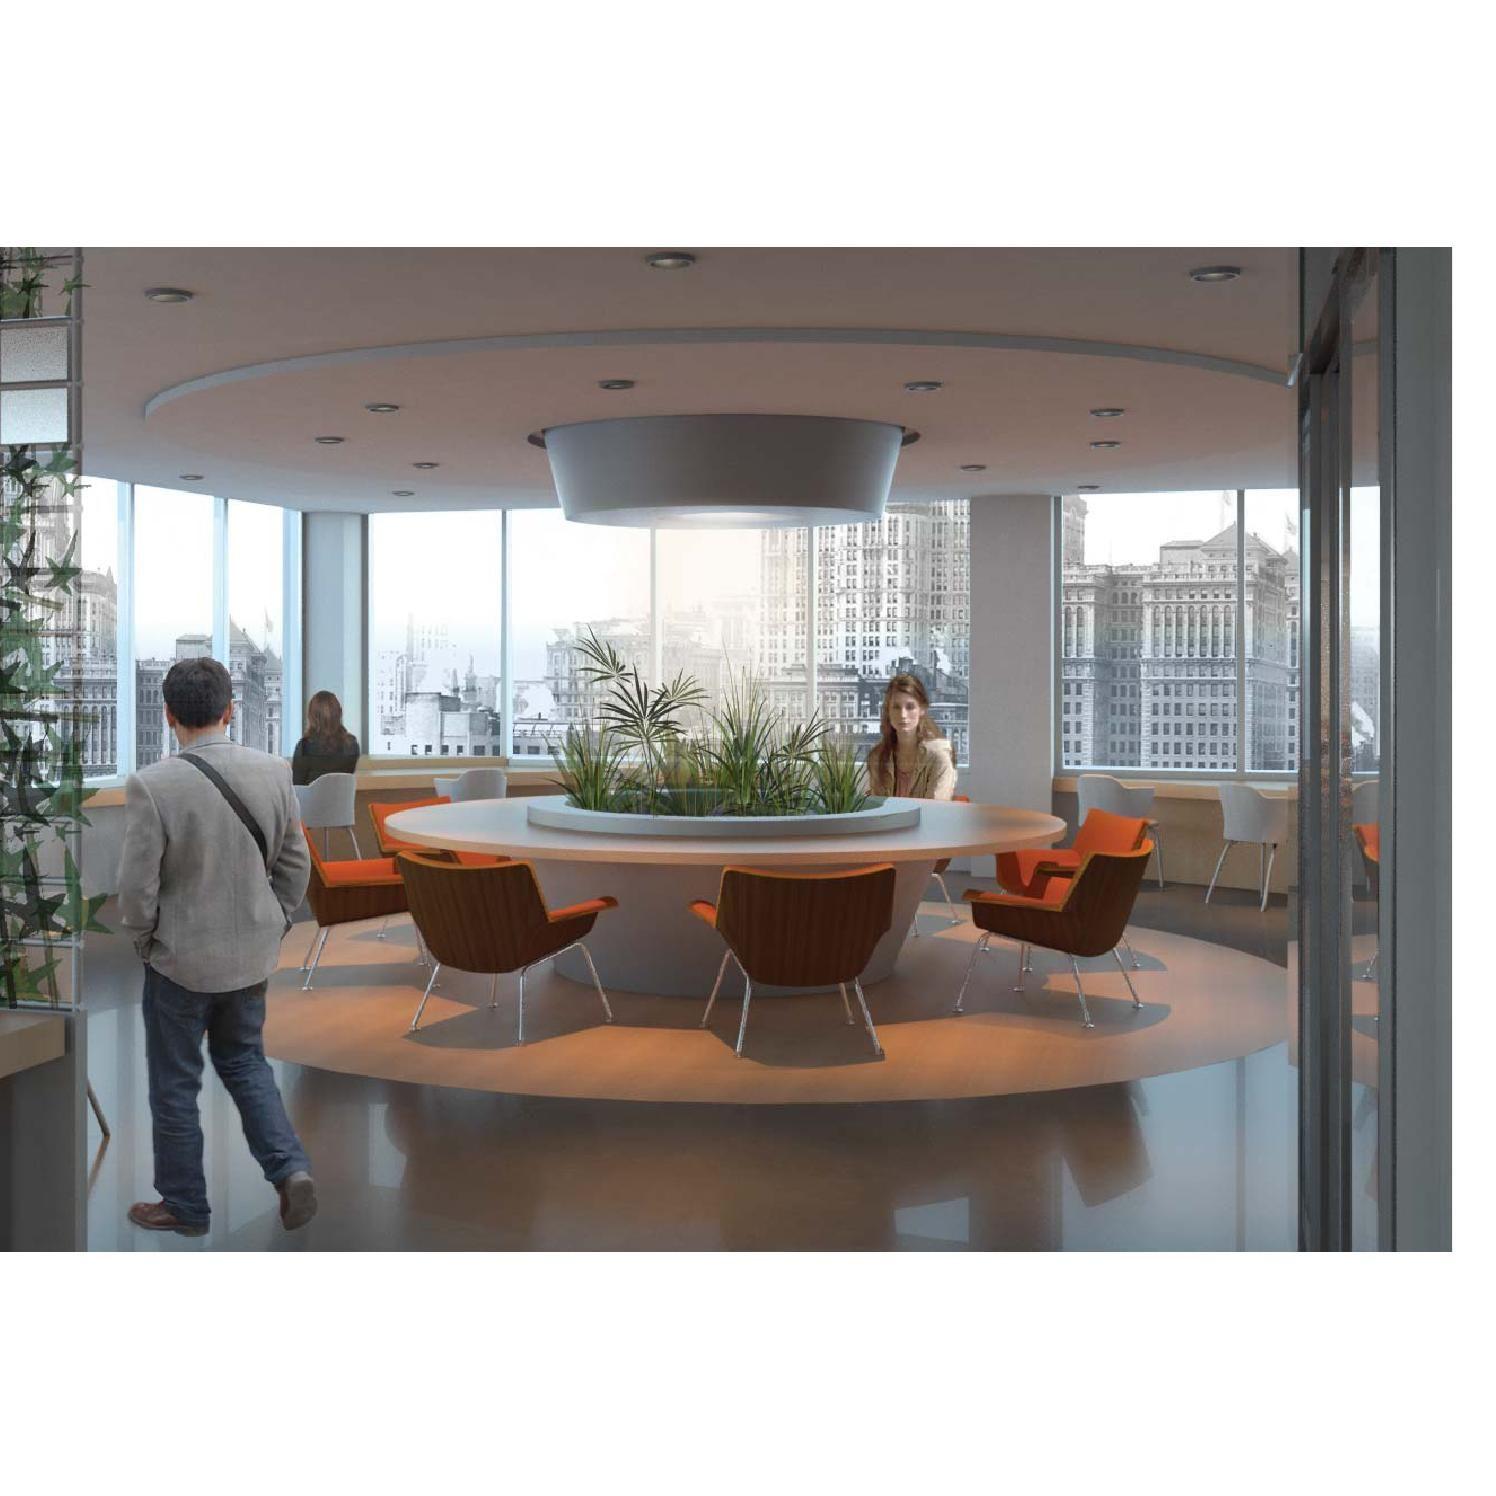 Issuu Interior Architecture And Product Design Portfolio By